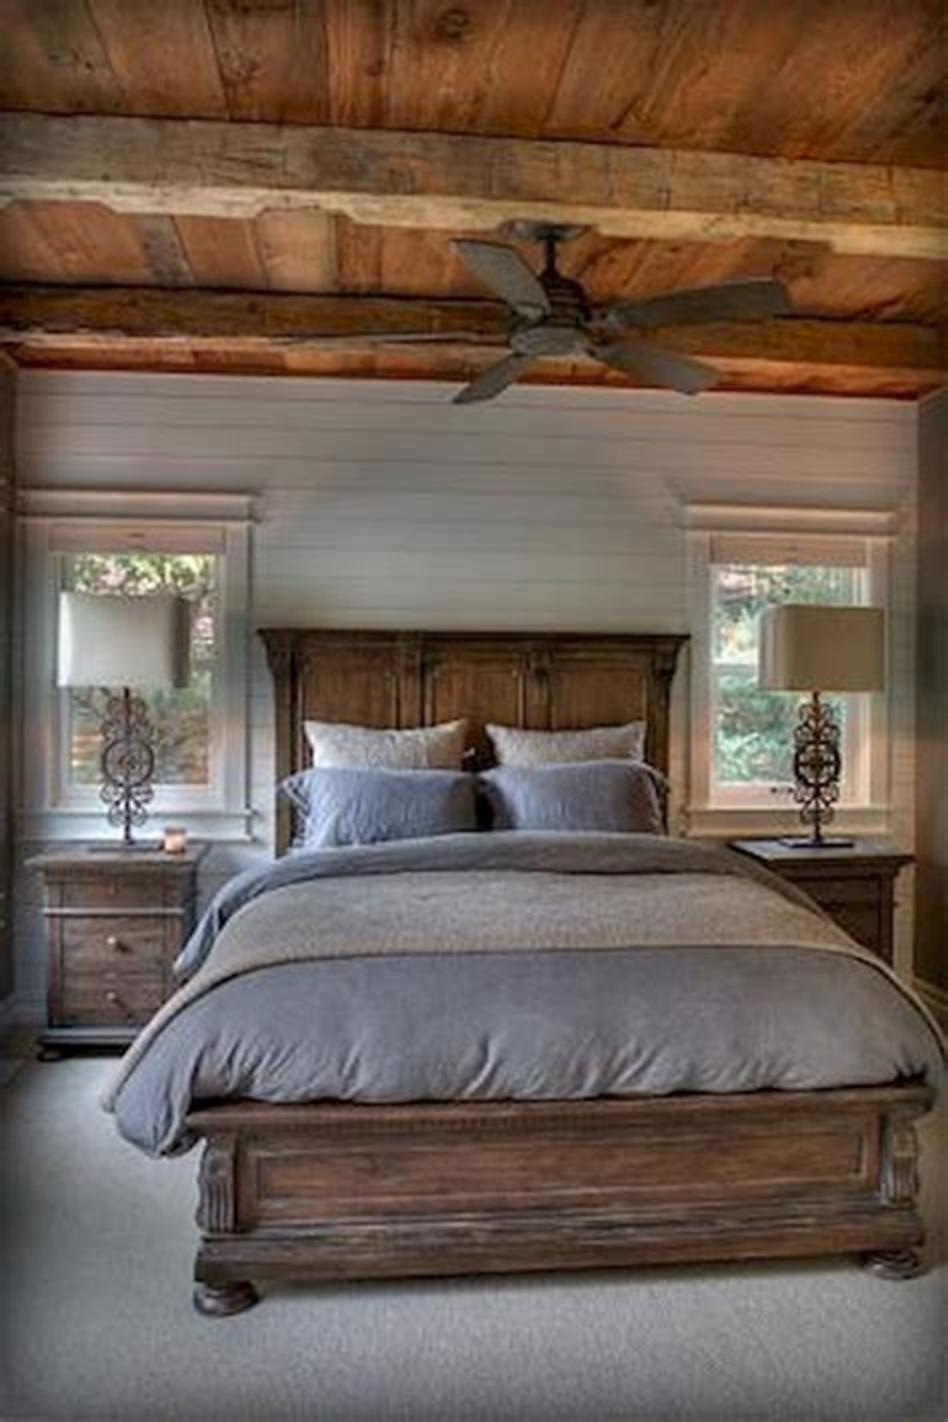 48 Stunning Farmhouse Master Bedroom Design Ideas 2019 26 Farmhouse Style Master Bedroom Farmhouse Master Bedroom Rustic Master Bedroom Decor